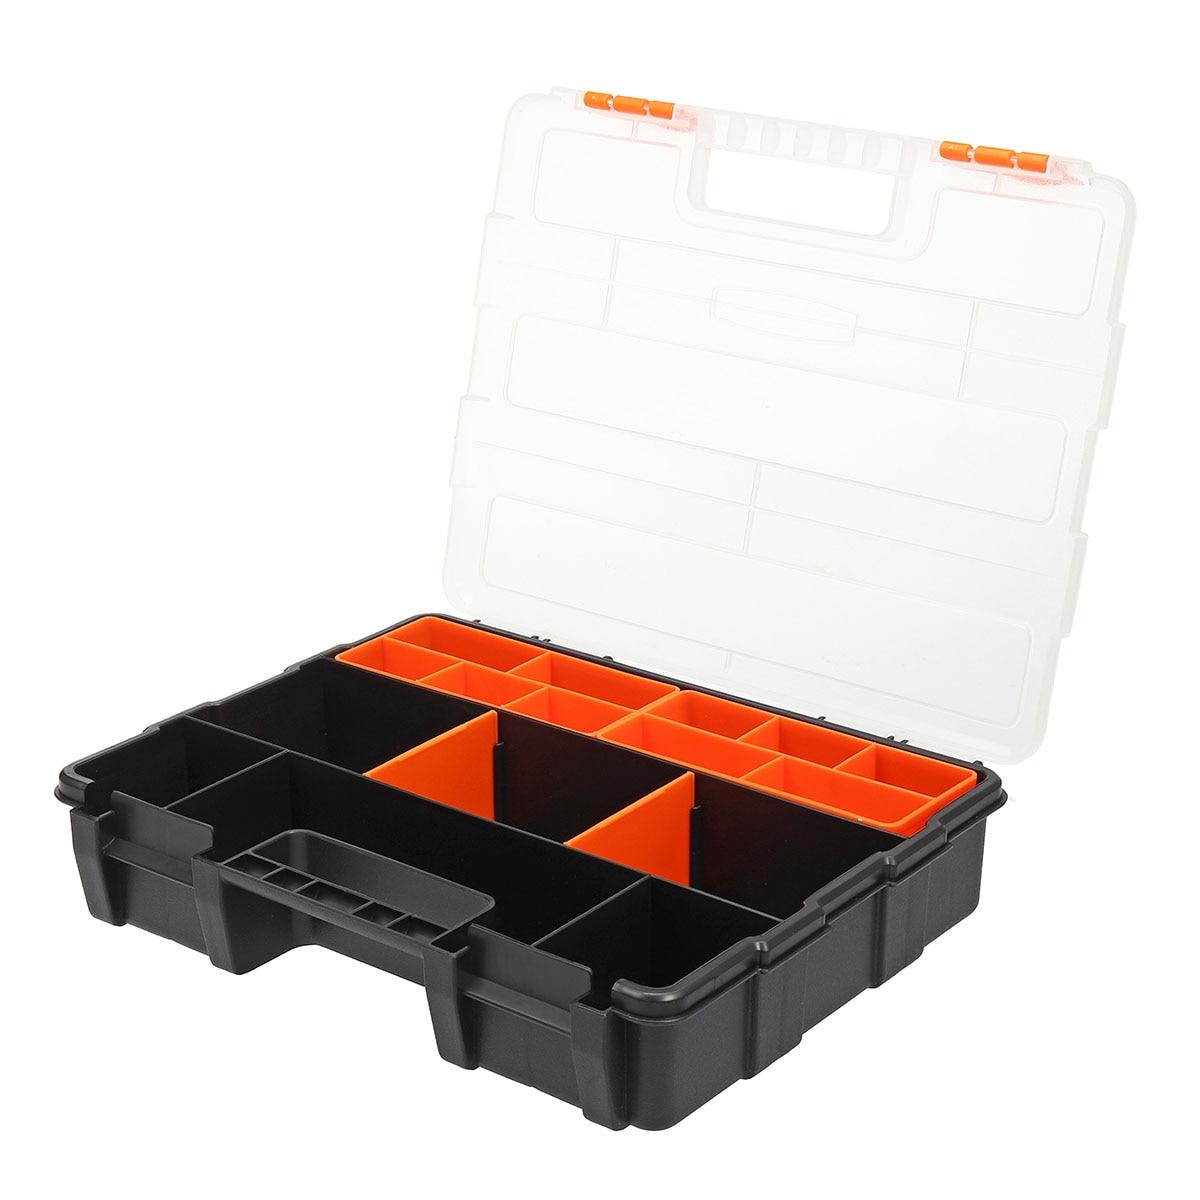 Spanner Screw Parts Hardware Organizer Box Kit Tool-Box Storage Plastic Carry Tool Storage Case